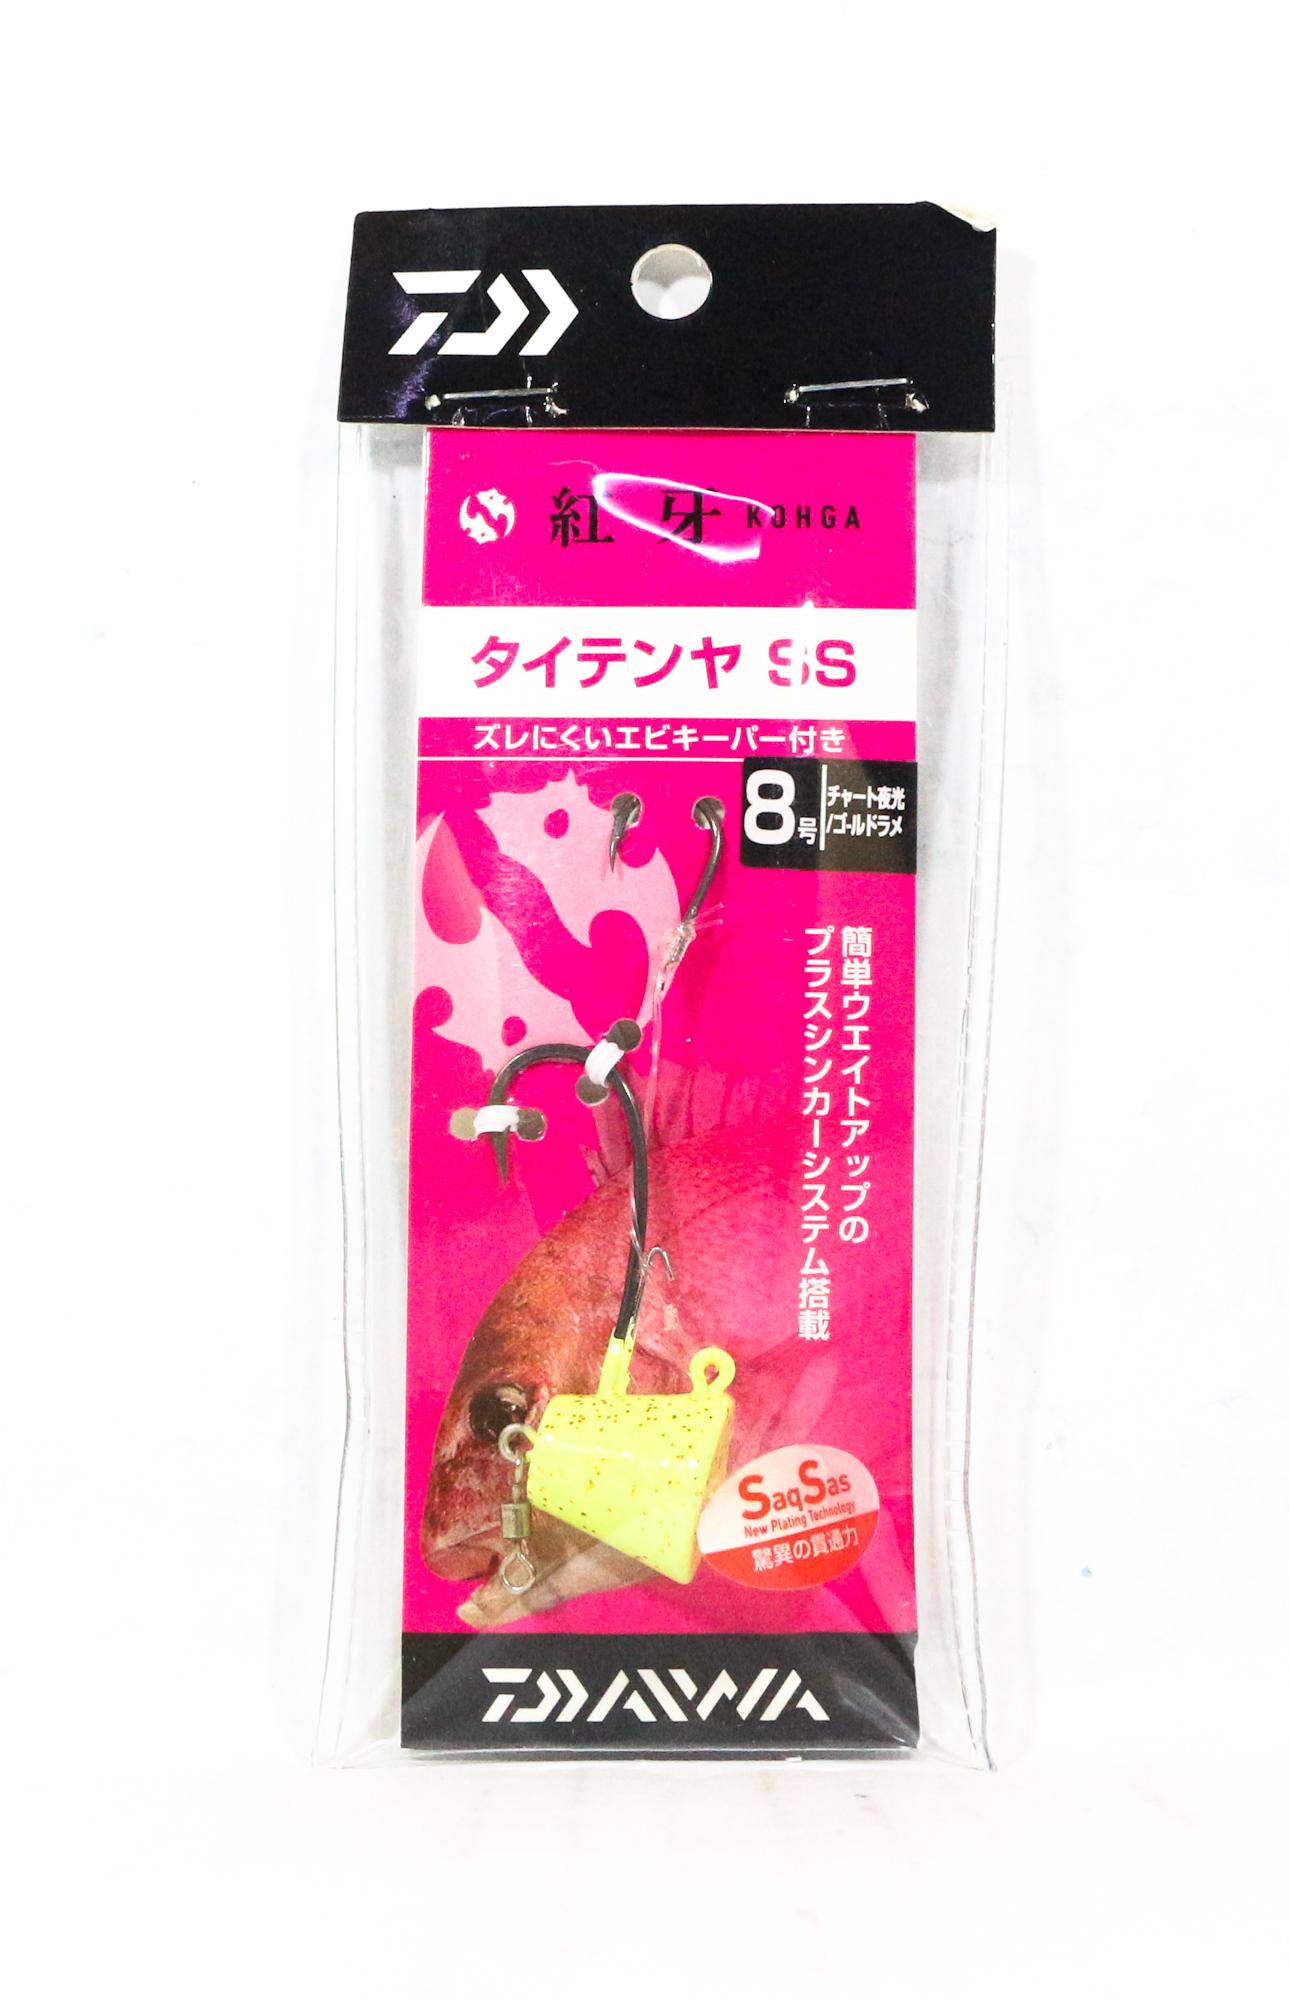 Daiwa Kohga Tenya Lure SS Size 8 Glow (0805)